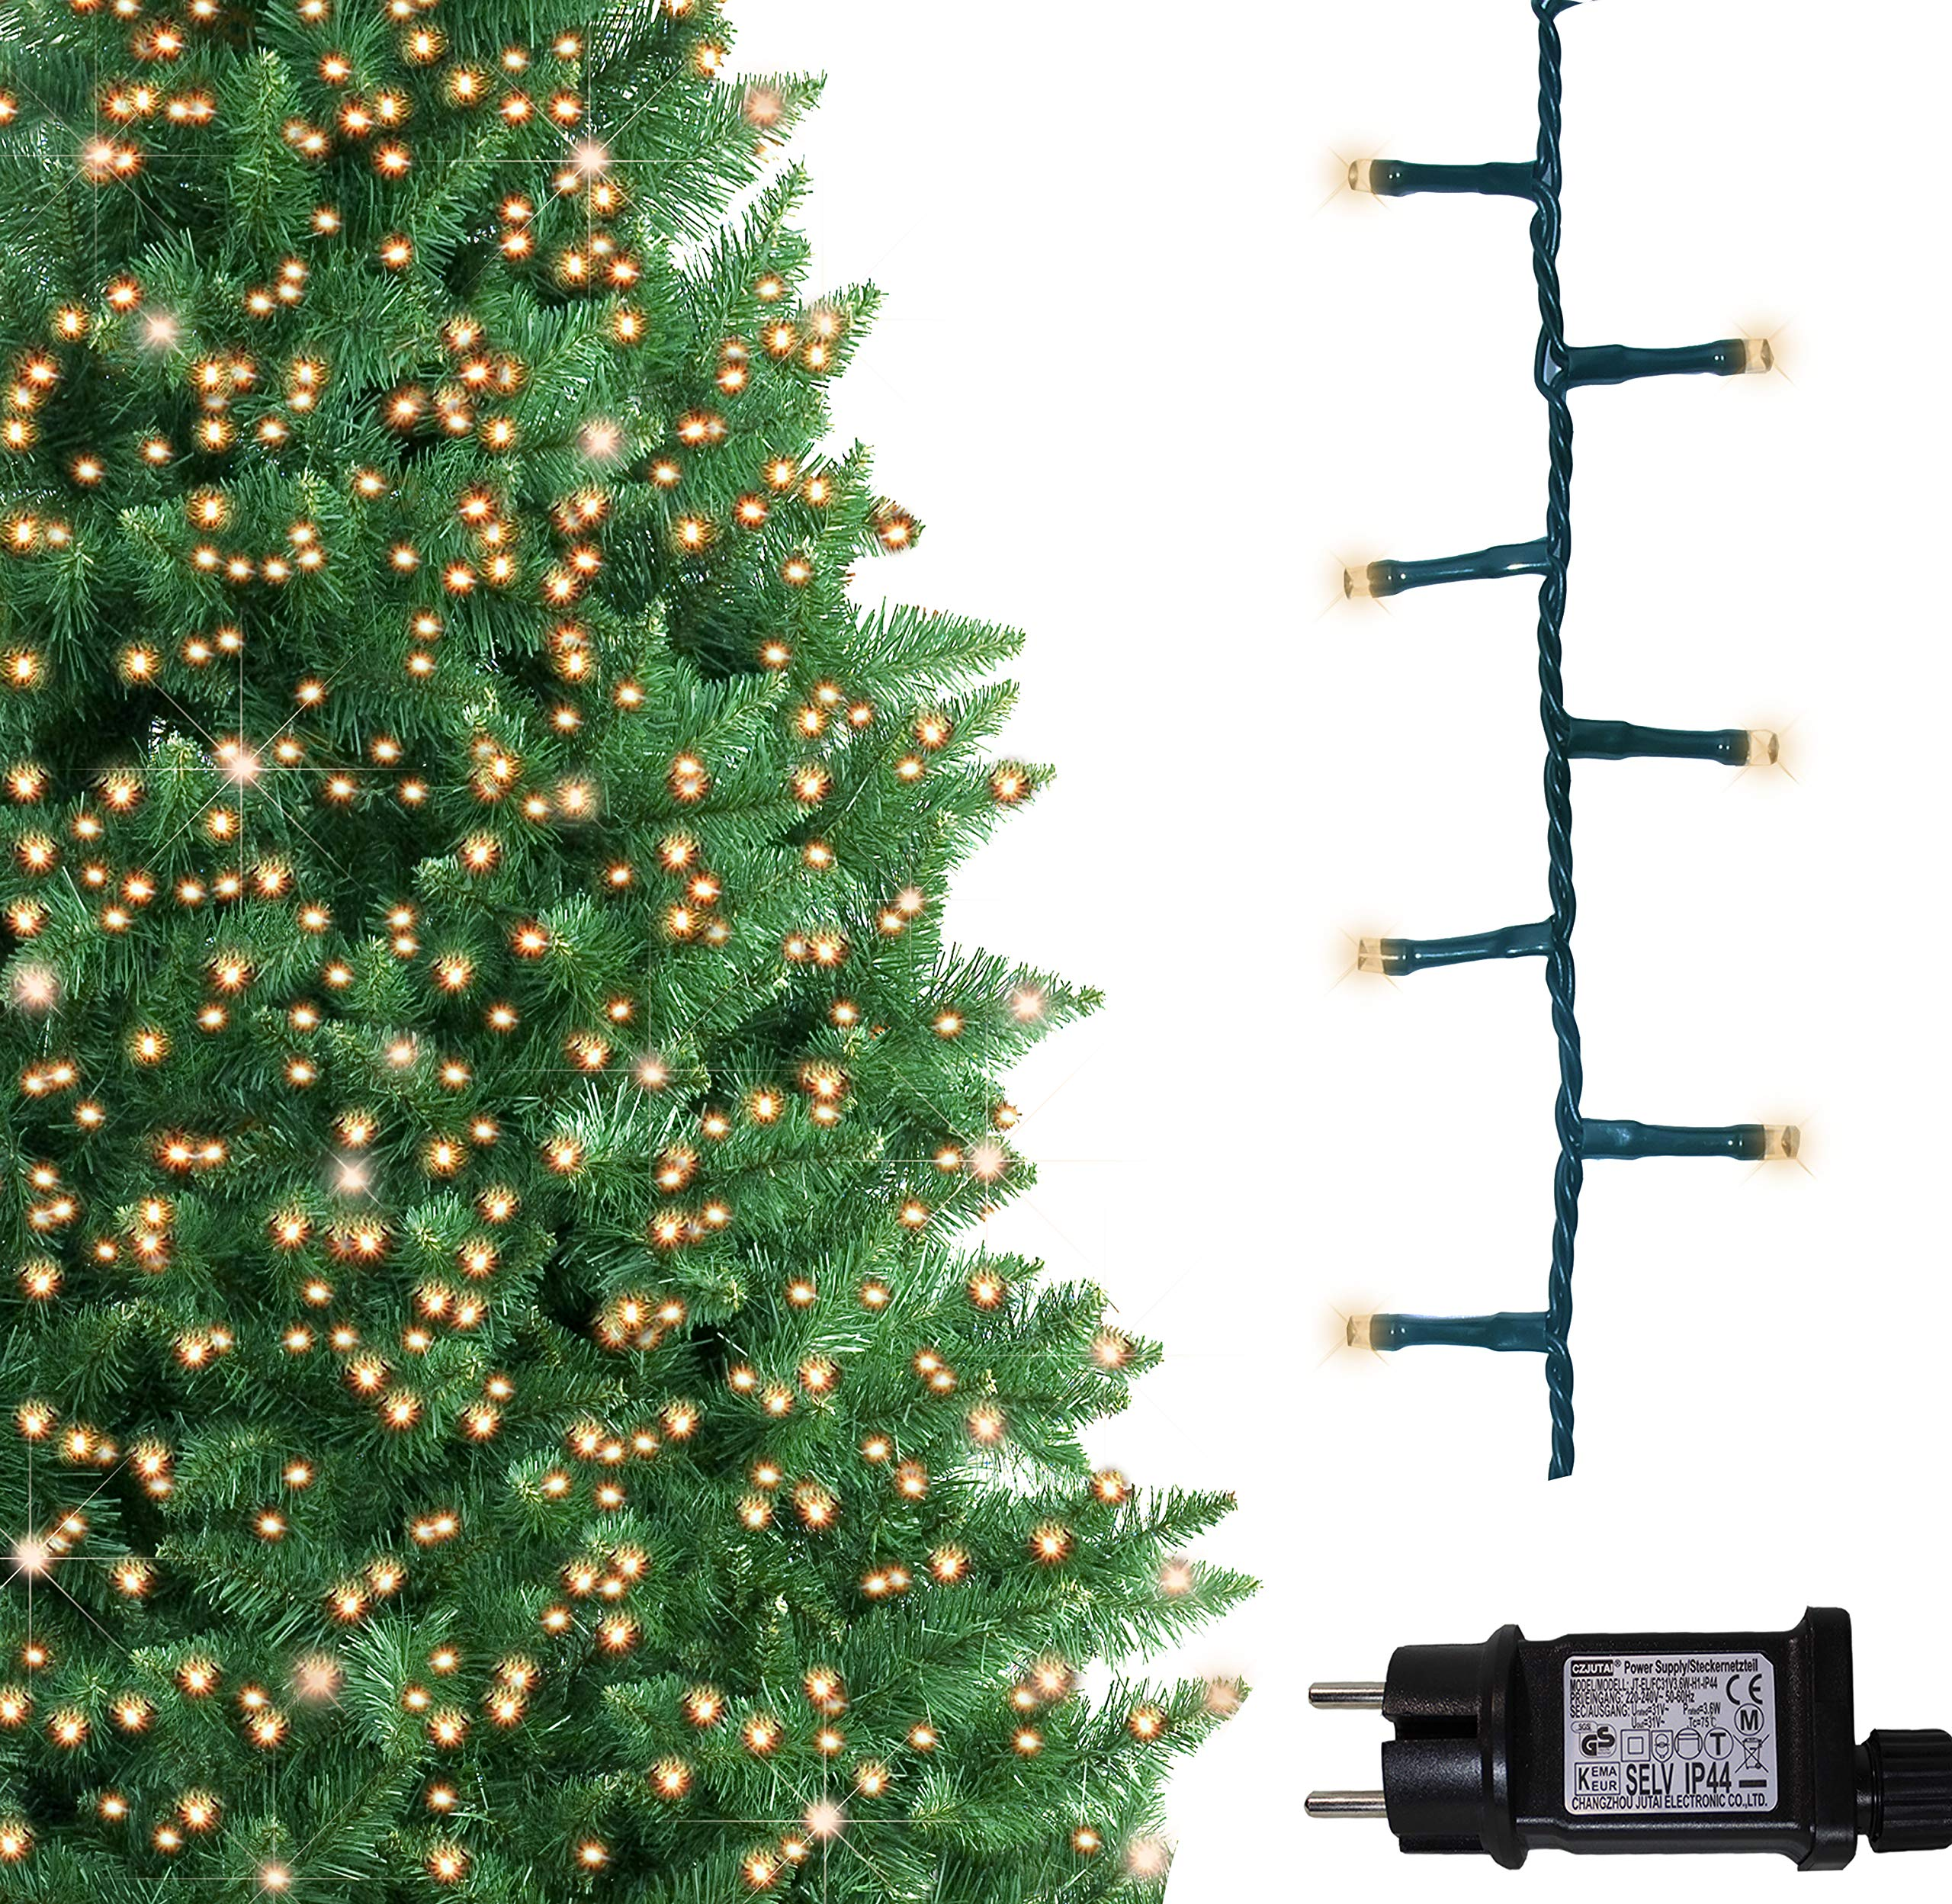 500 luces LED brillantes del árbol Luces blancas del árbol Luces de luces navideñas para uso